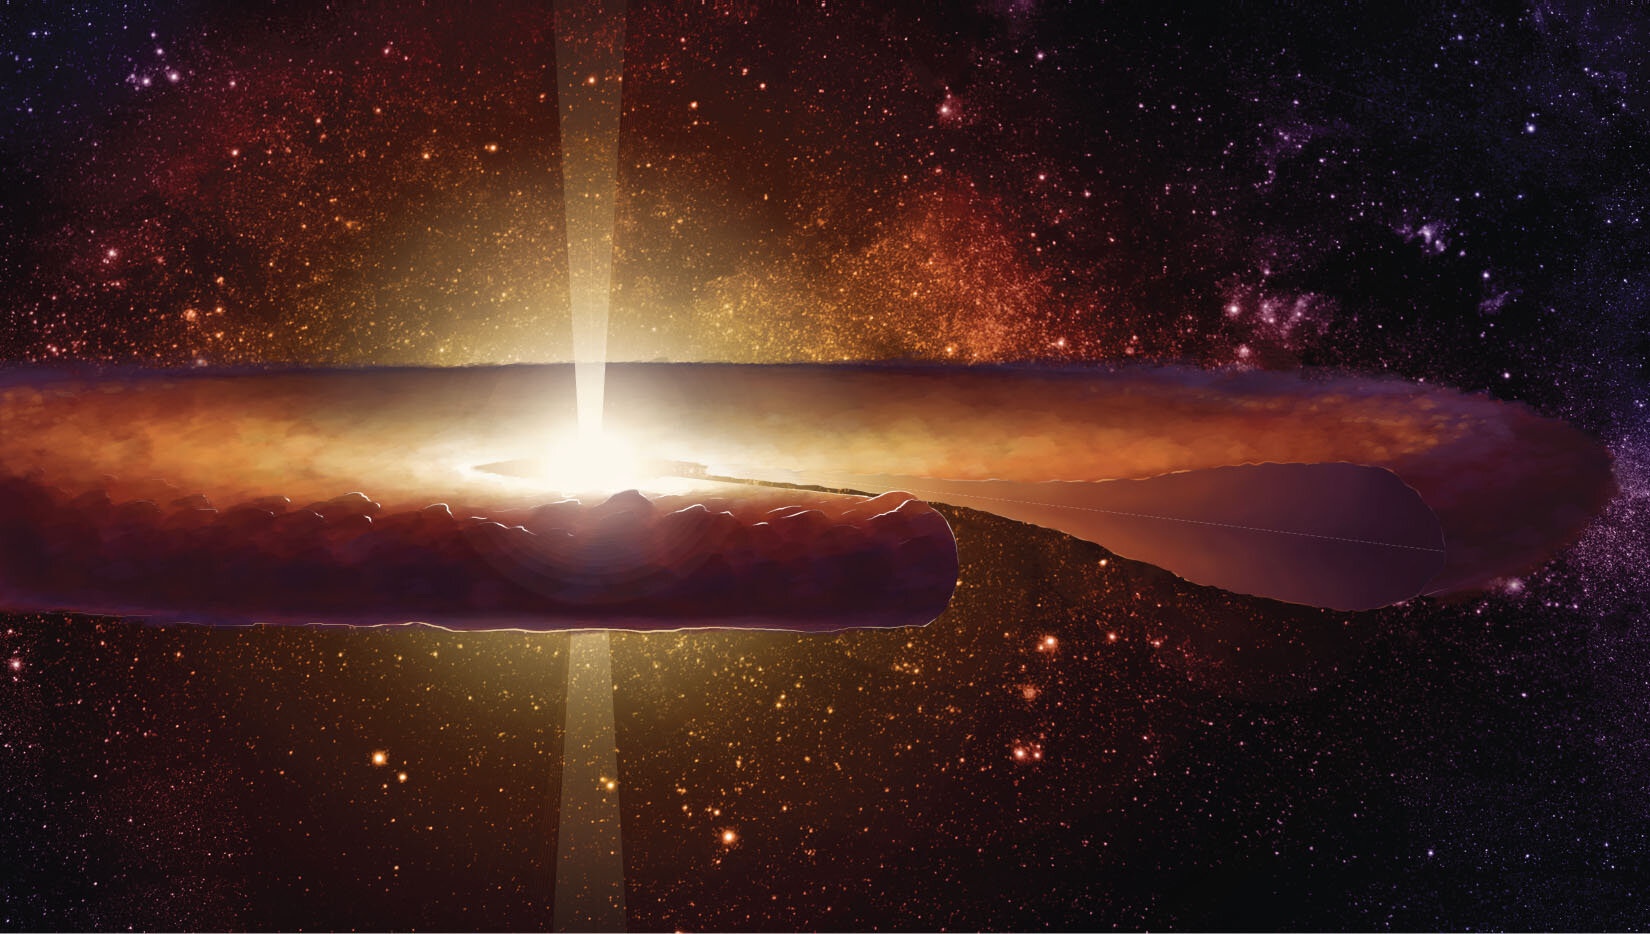 Researchers trace dust grain's journey through newborn solar system